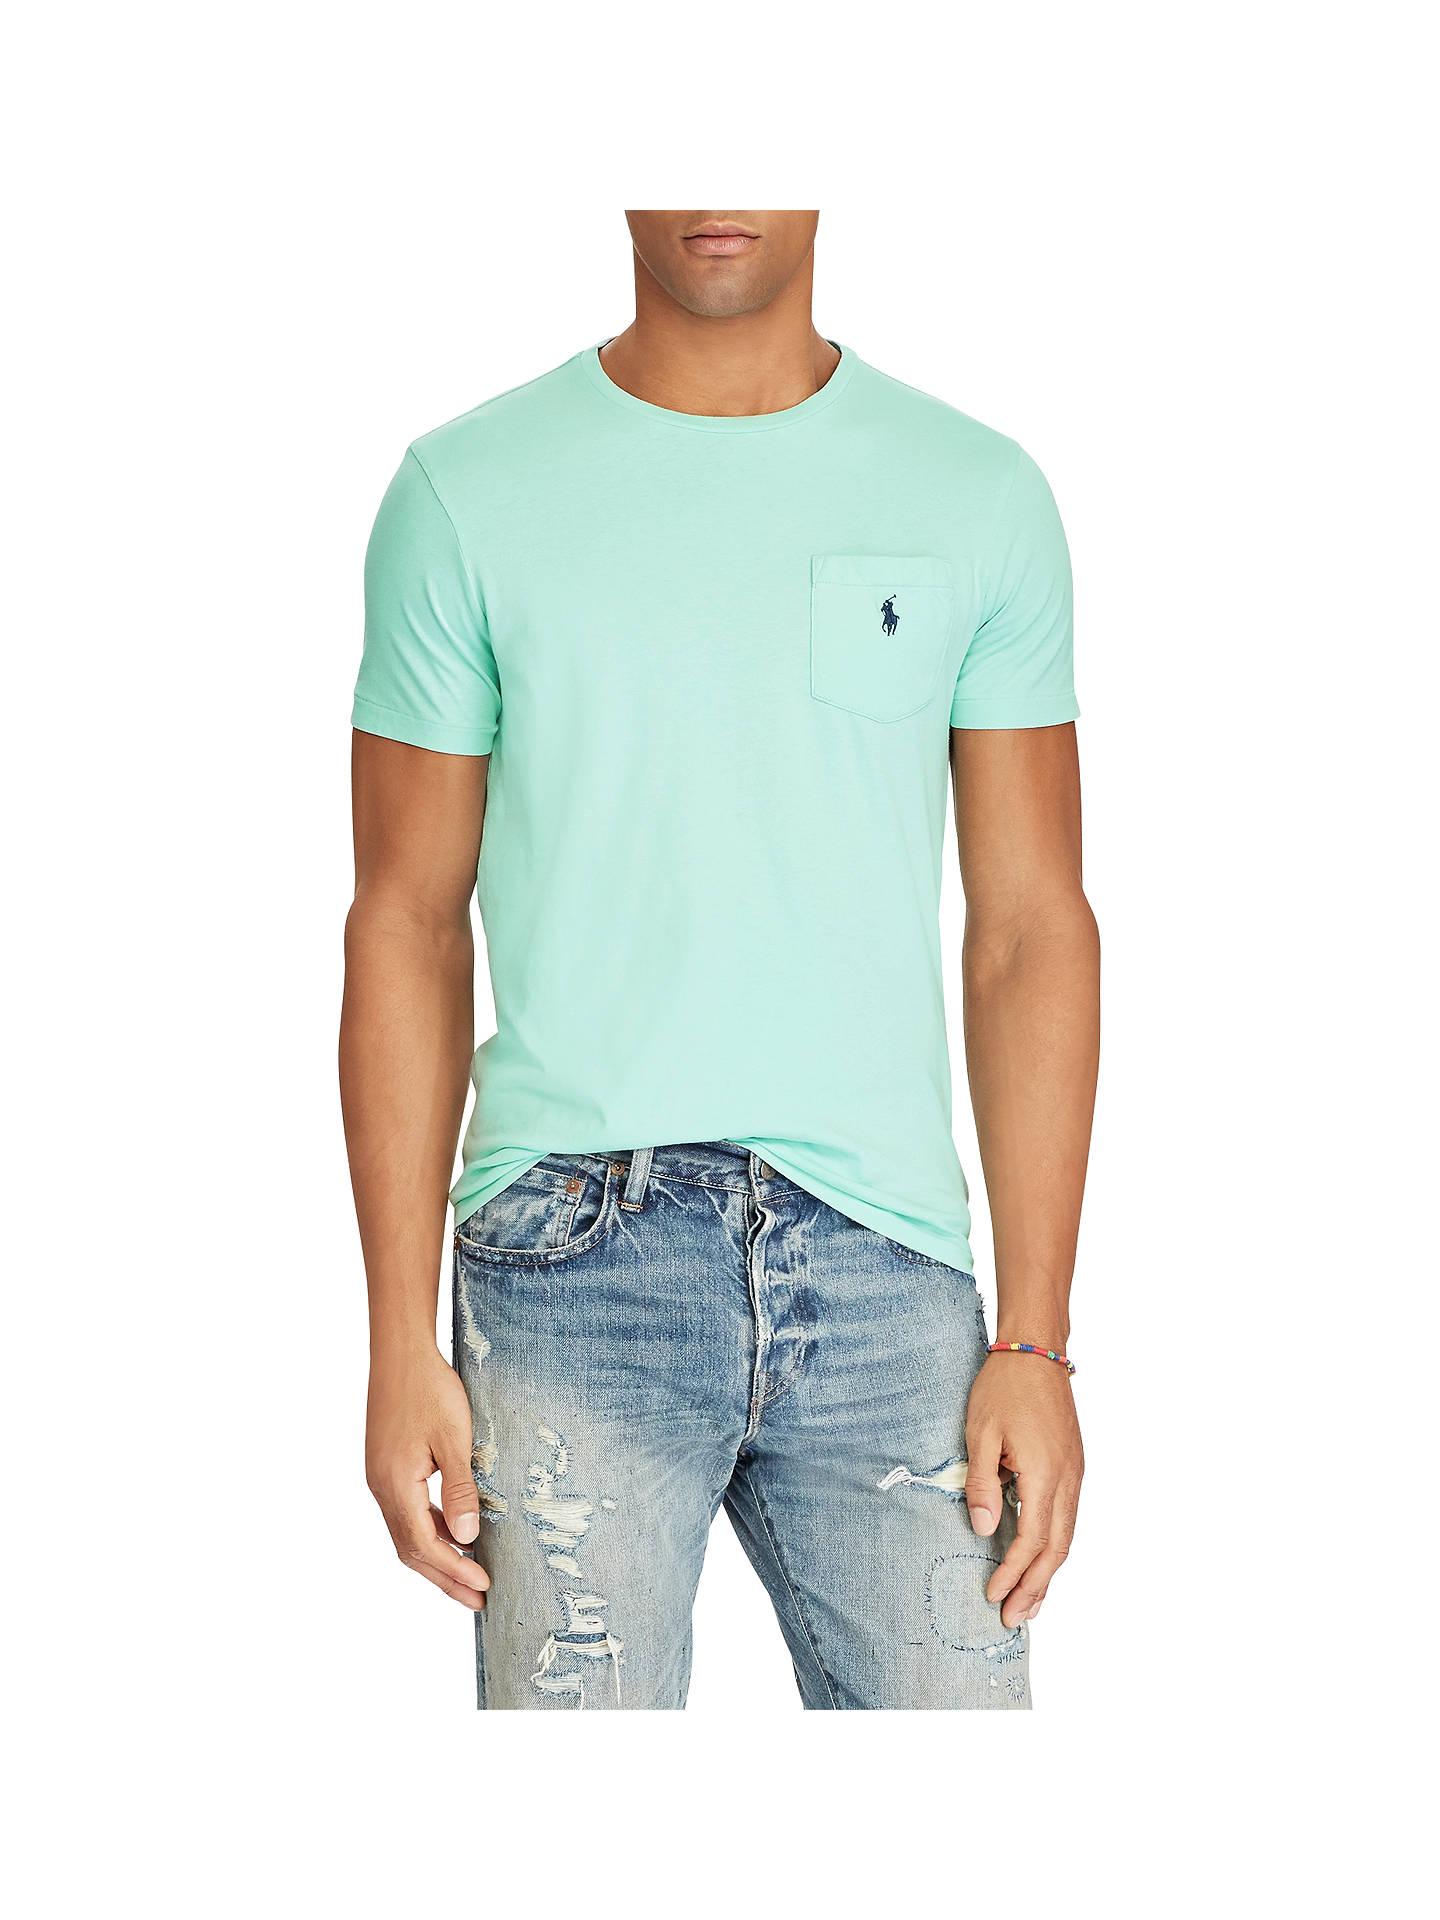 Bourgeon Fascinera Bungee jump  Polo Ralph Lauren Custom Fit Pocket T-Shirt, Bayside Green at John ...